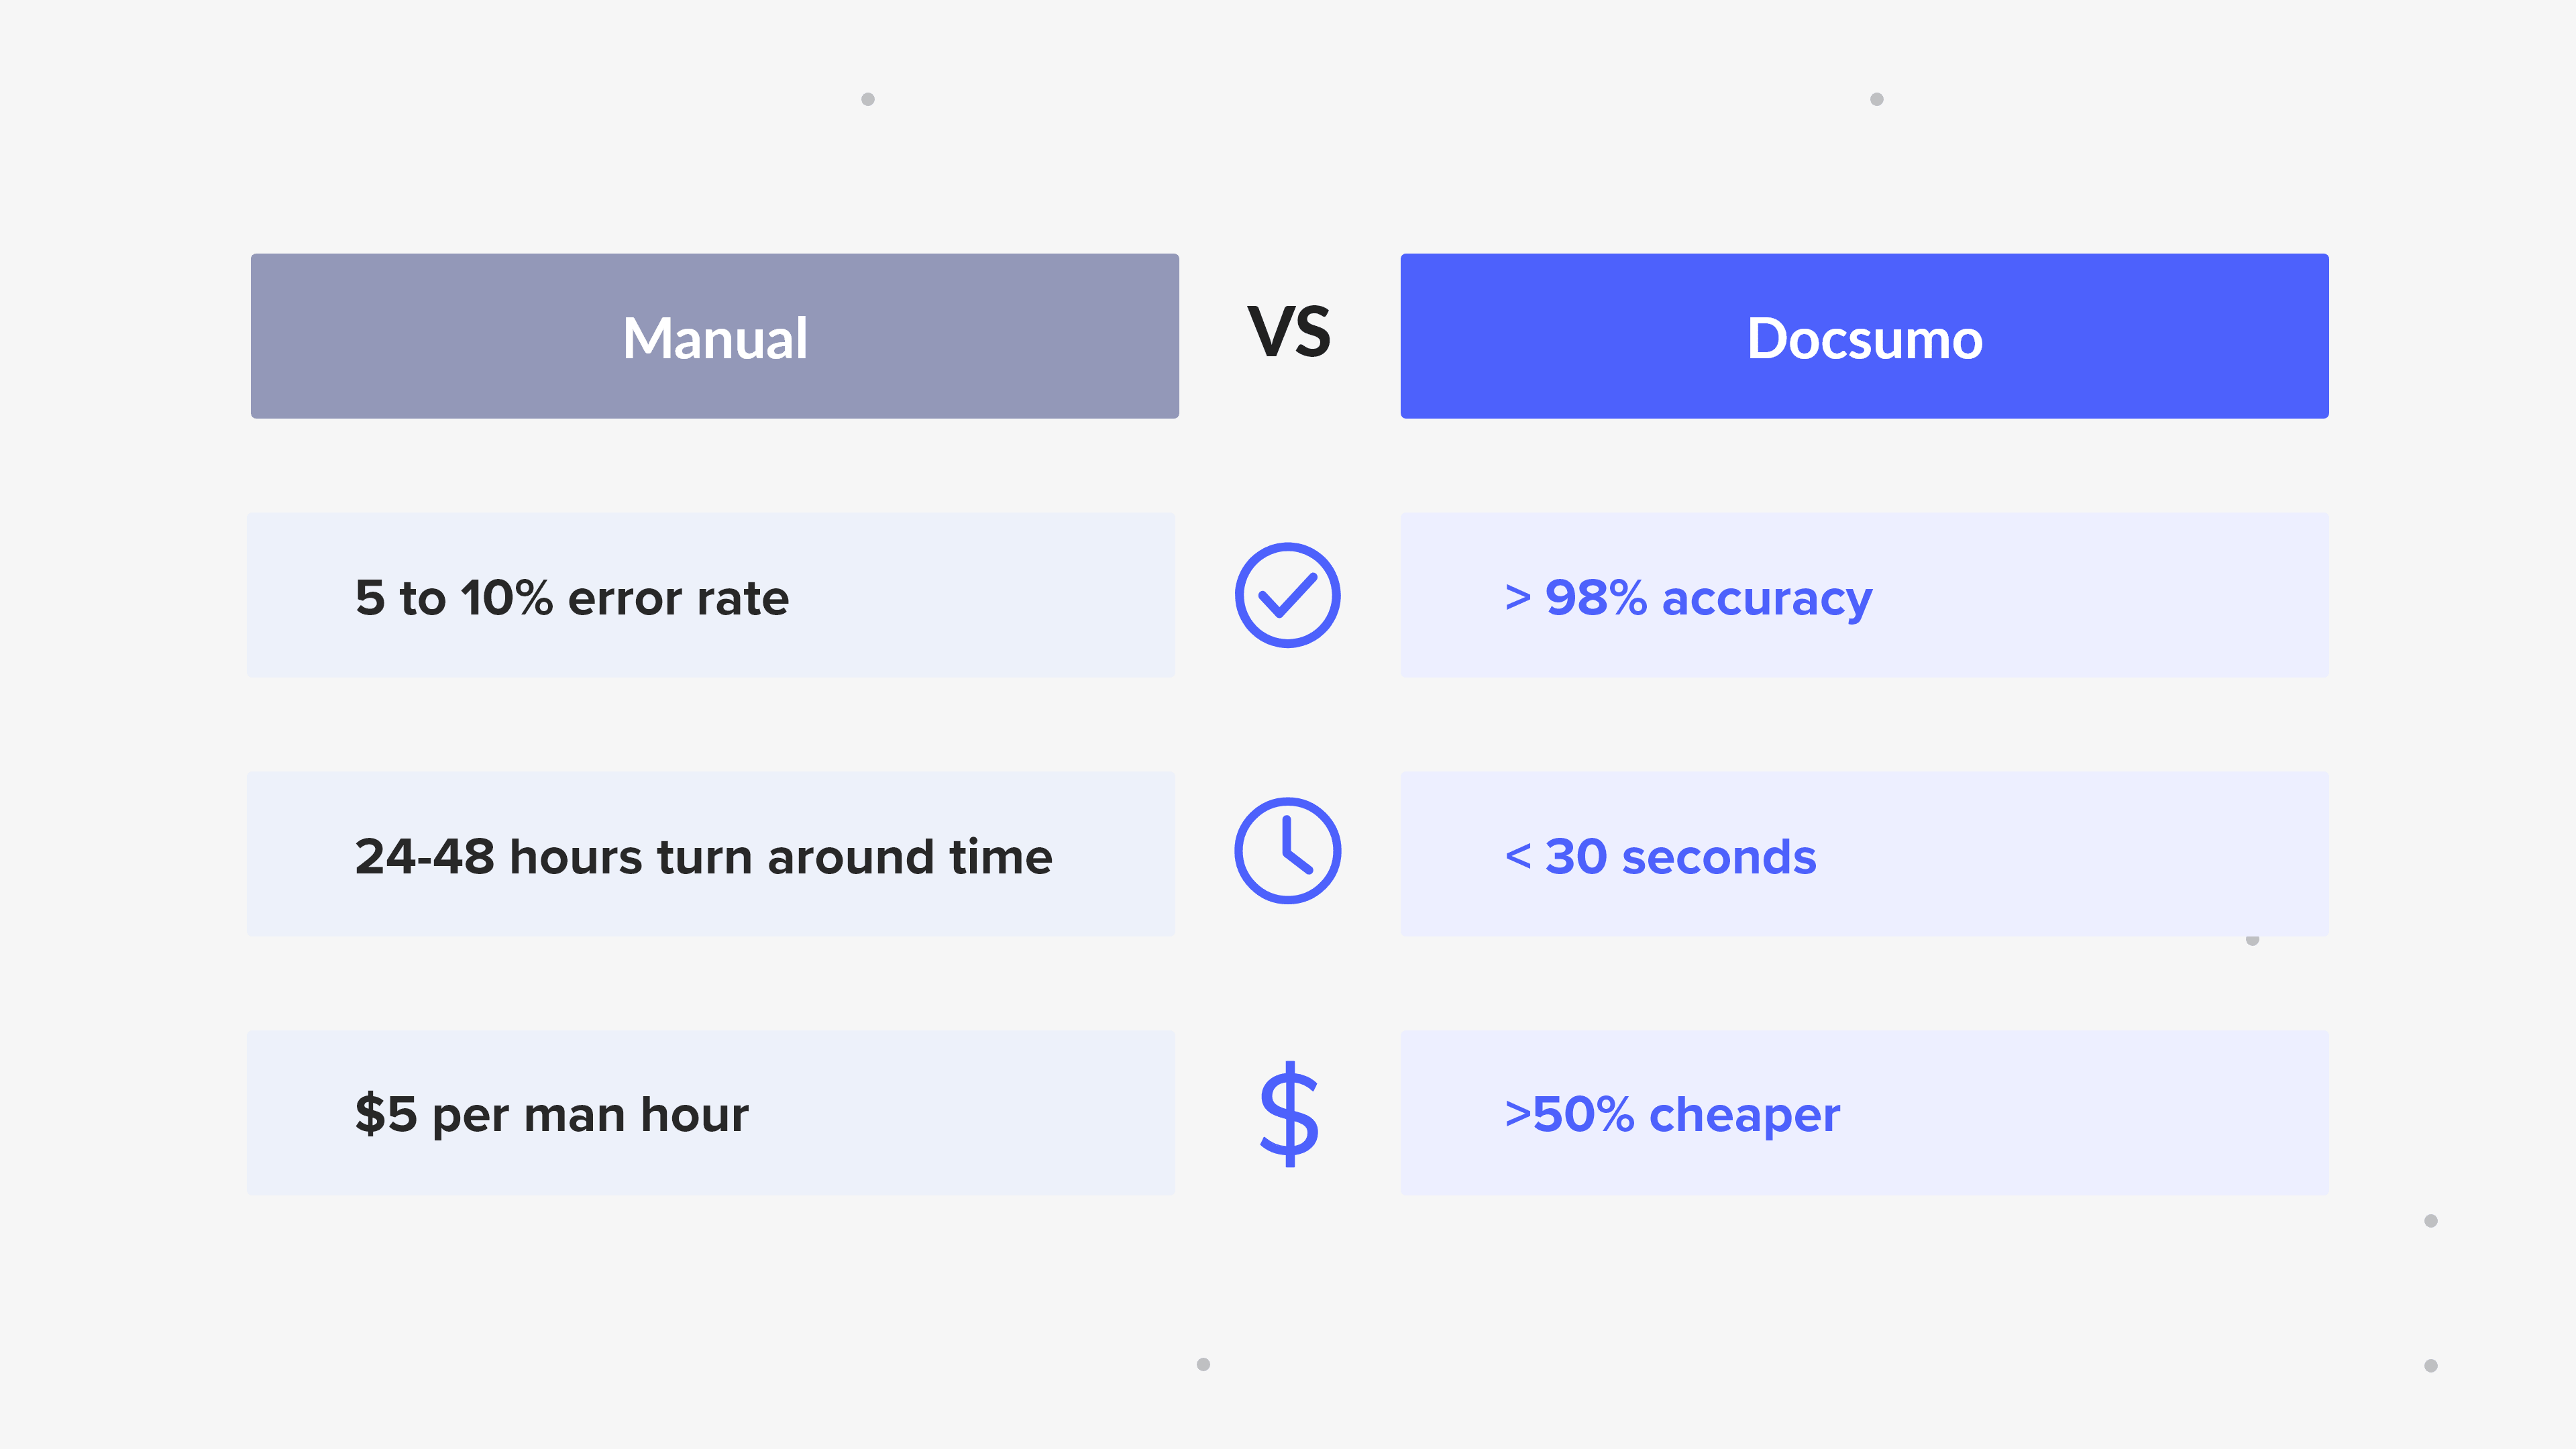 Manual vs Automated Data Capture